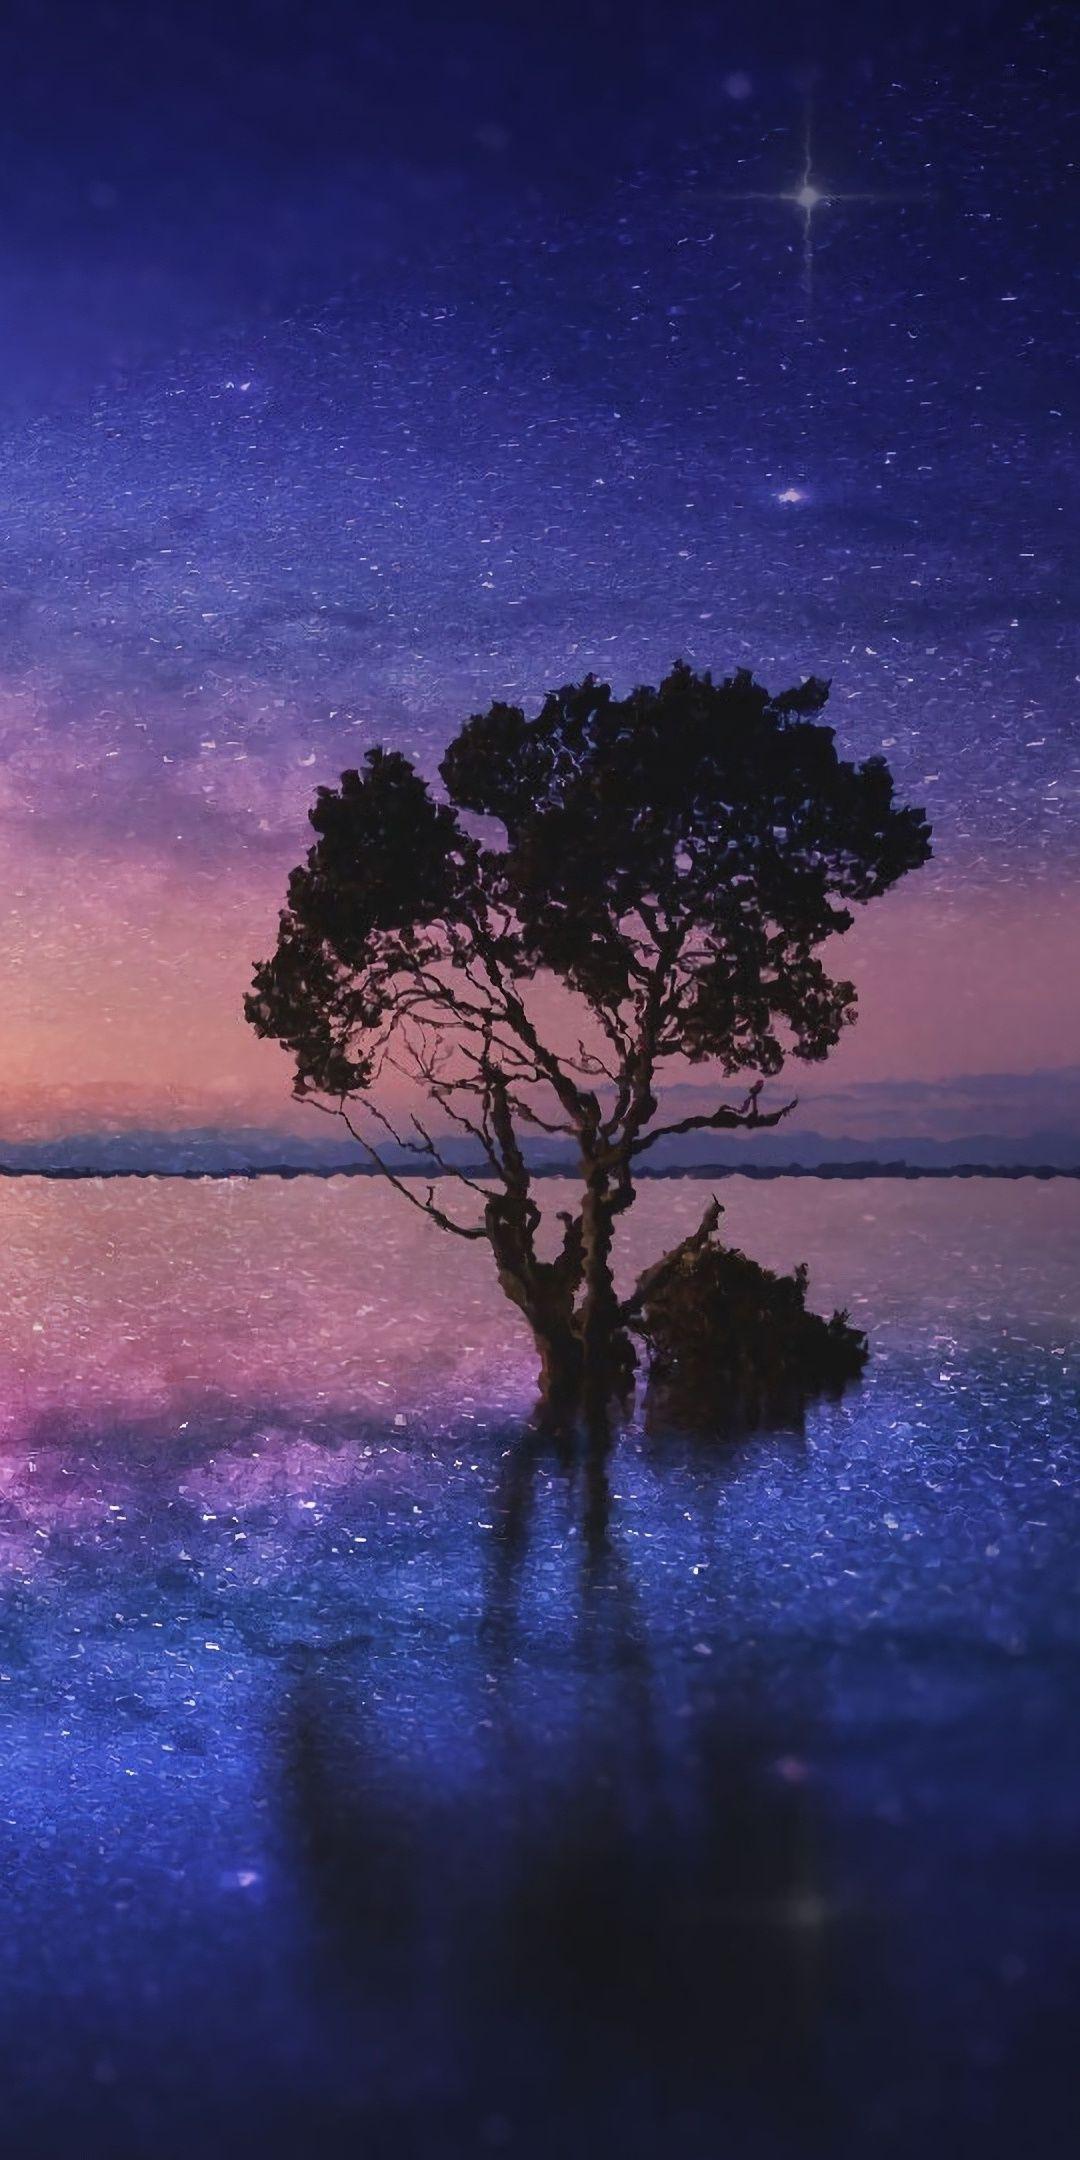 Silhouette Tree Lake Starry Night 1080x2160 Wallpaper Night Sky Wallpaper Starry Night Art Dark Wallpaper Iphone Wallpaper night starry sky lake trees